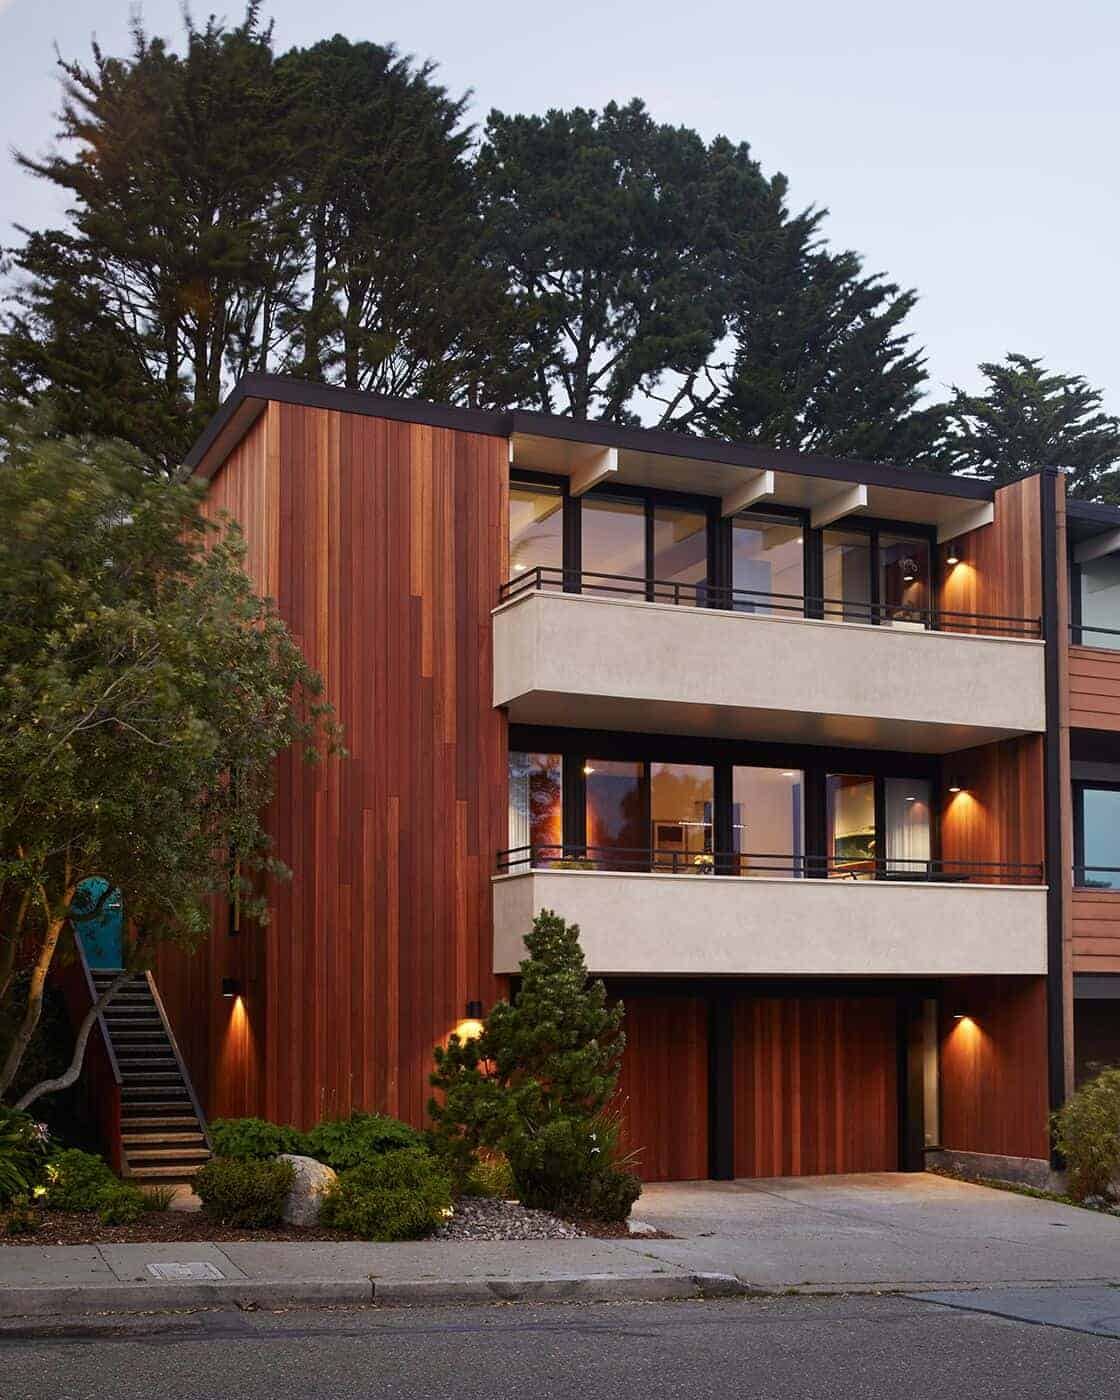 San Francisco Eichler Remodel-Klopf Architecture-04-1 Kindesign